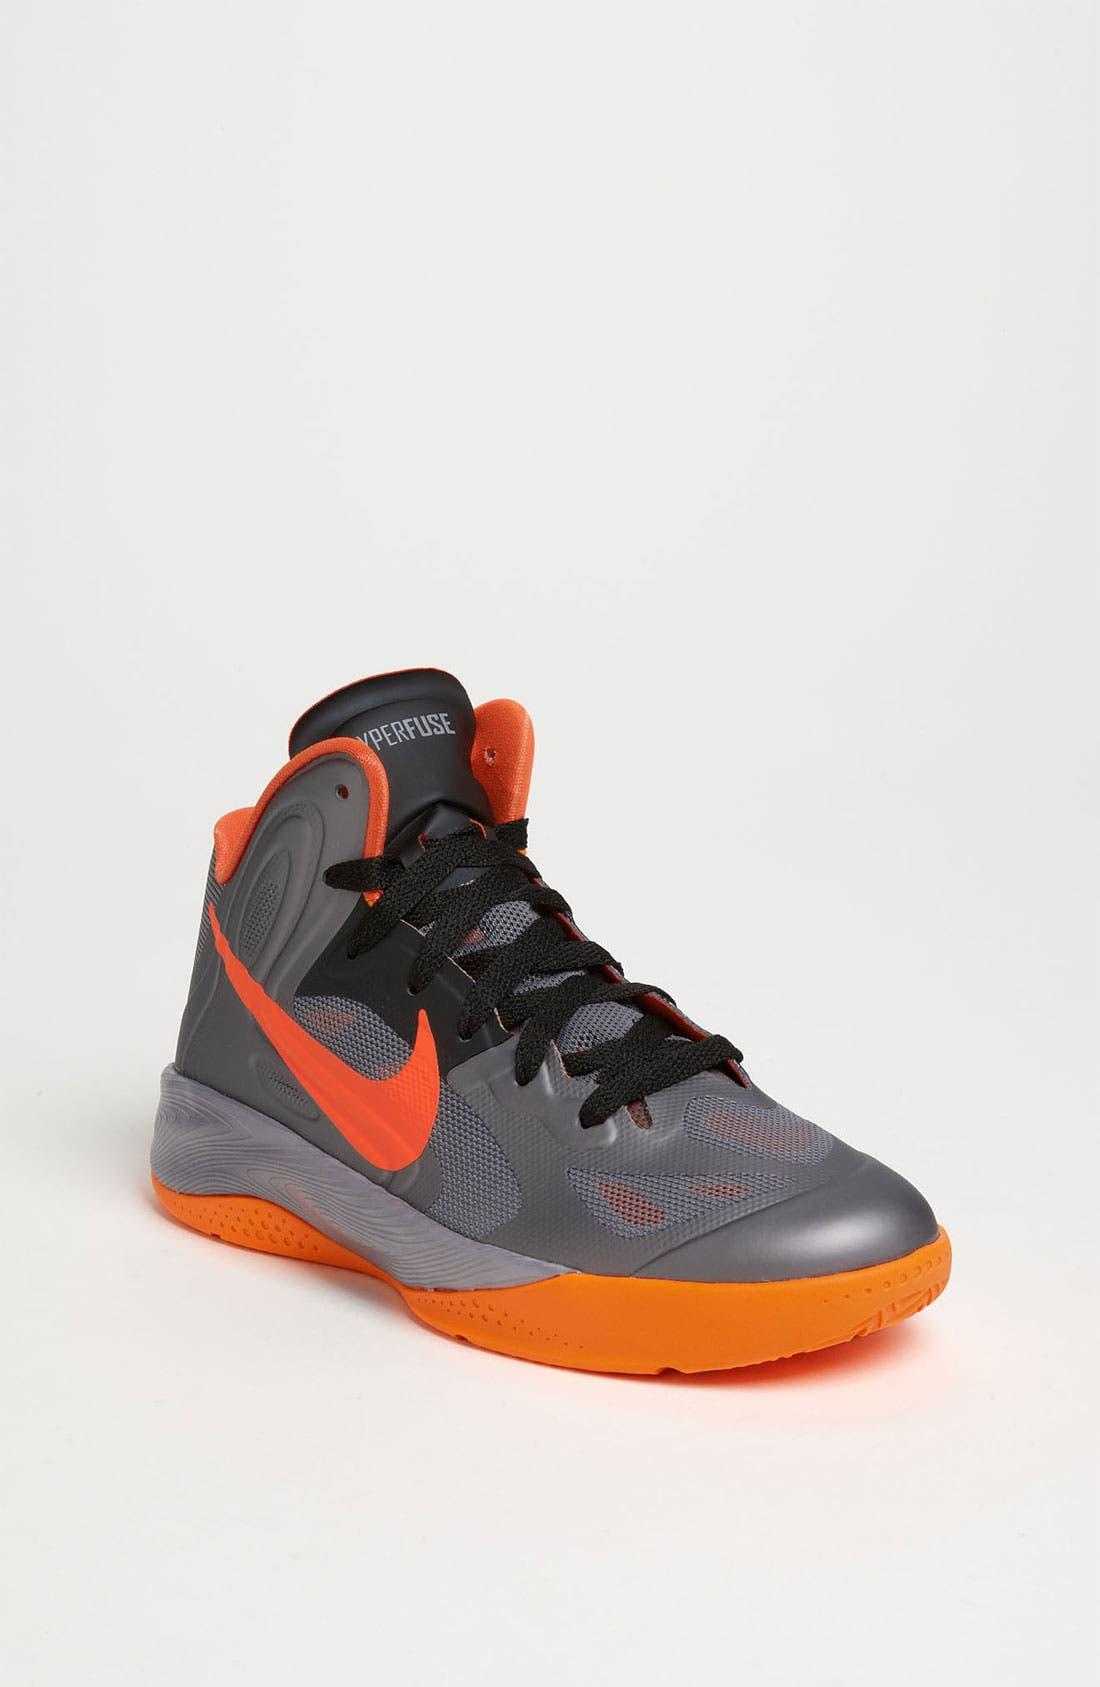 Main Image - Nike 'Hyperfuse 2012' Basketball Shoe (Big Kid)